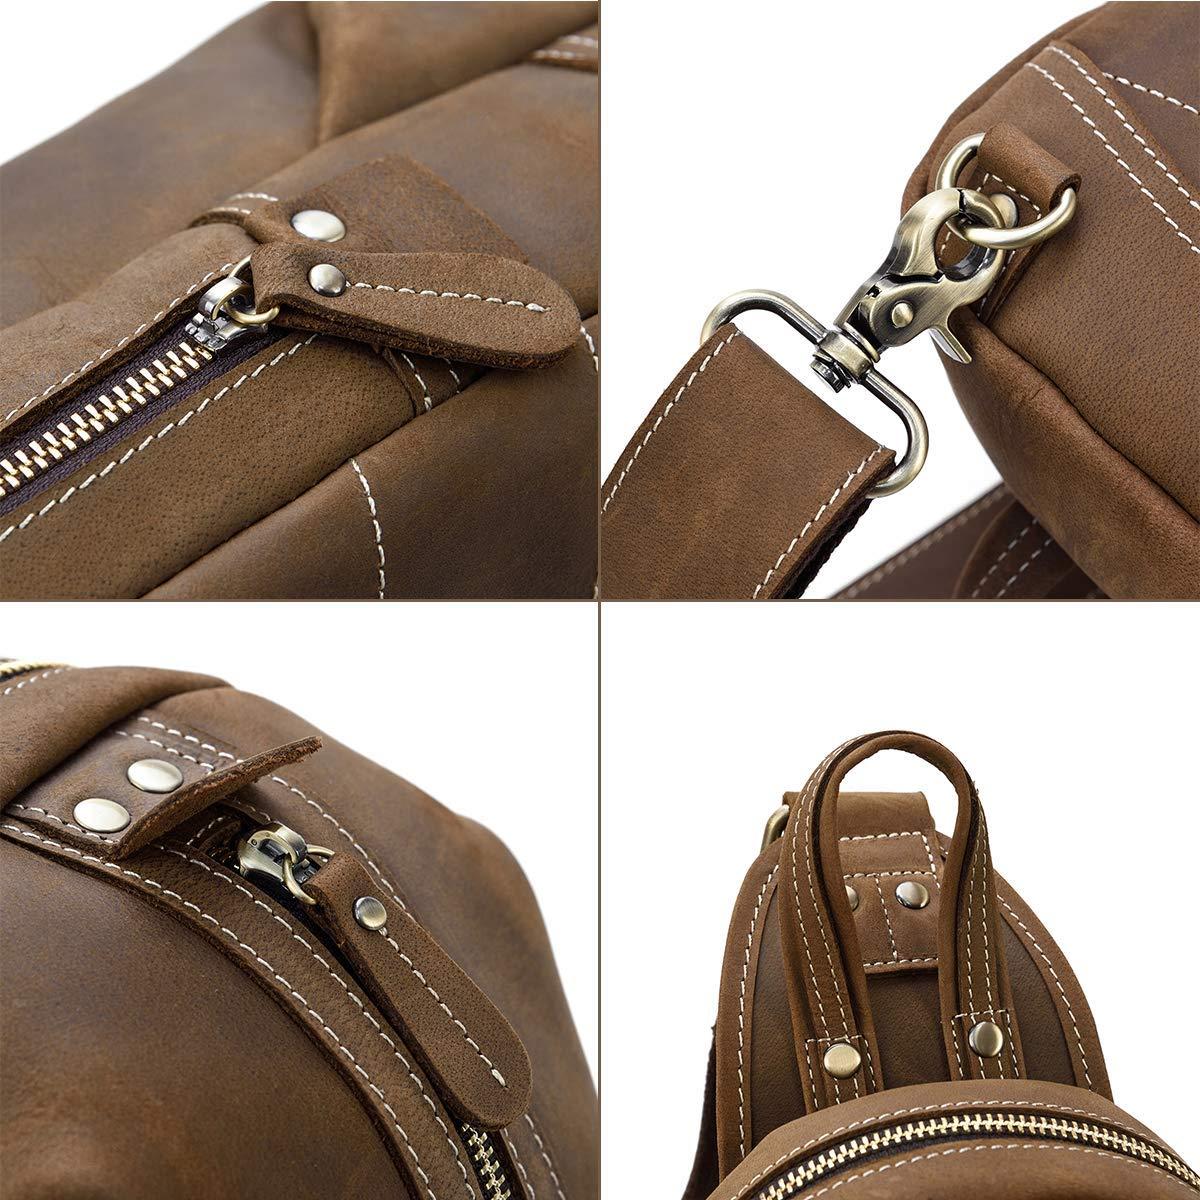 Brown 1 Luufan Hommes Sac /à bandouli/ère en cuir v/éritable sac /à bandouli/ère r/étro une /épaule 2way Durable Cross Body Bag Small